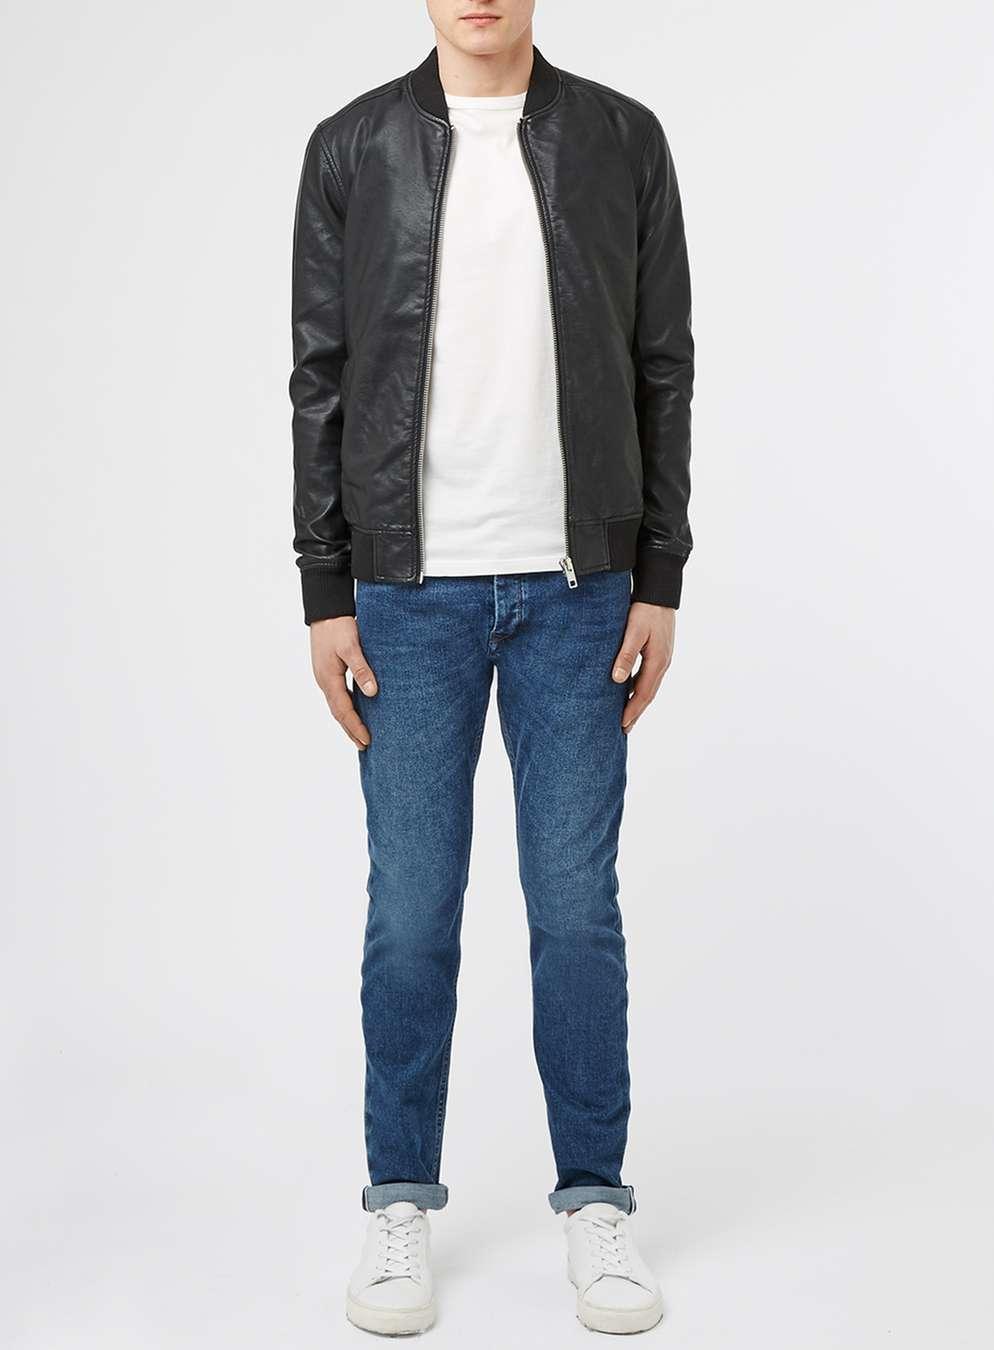 Topman leather bomber jacket